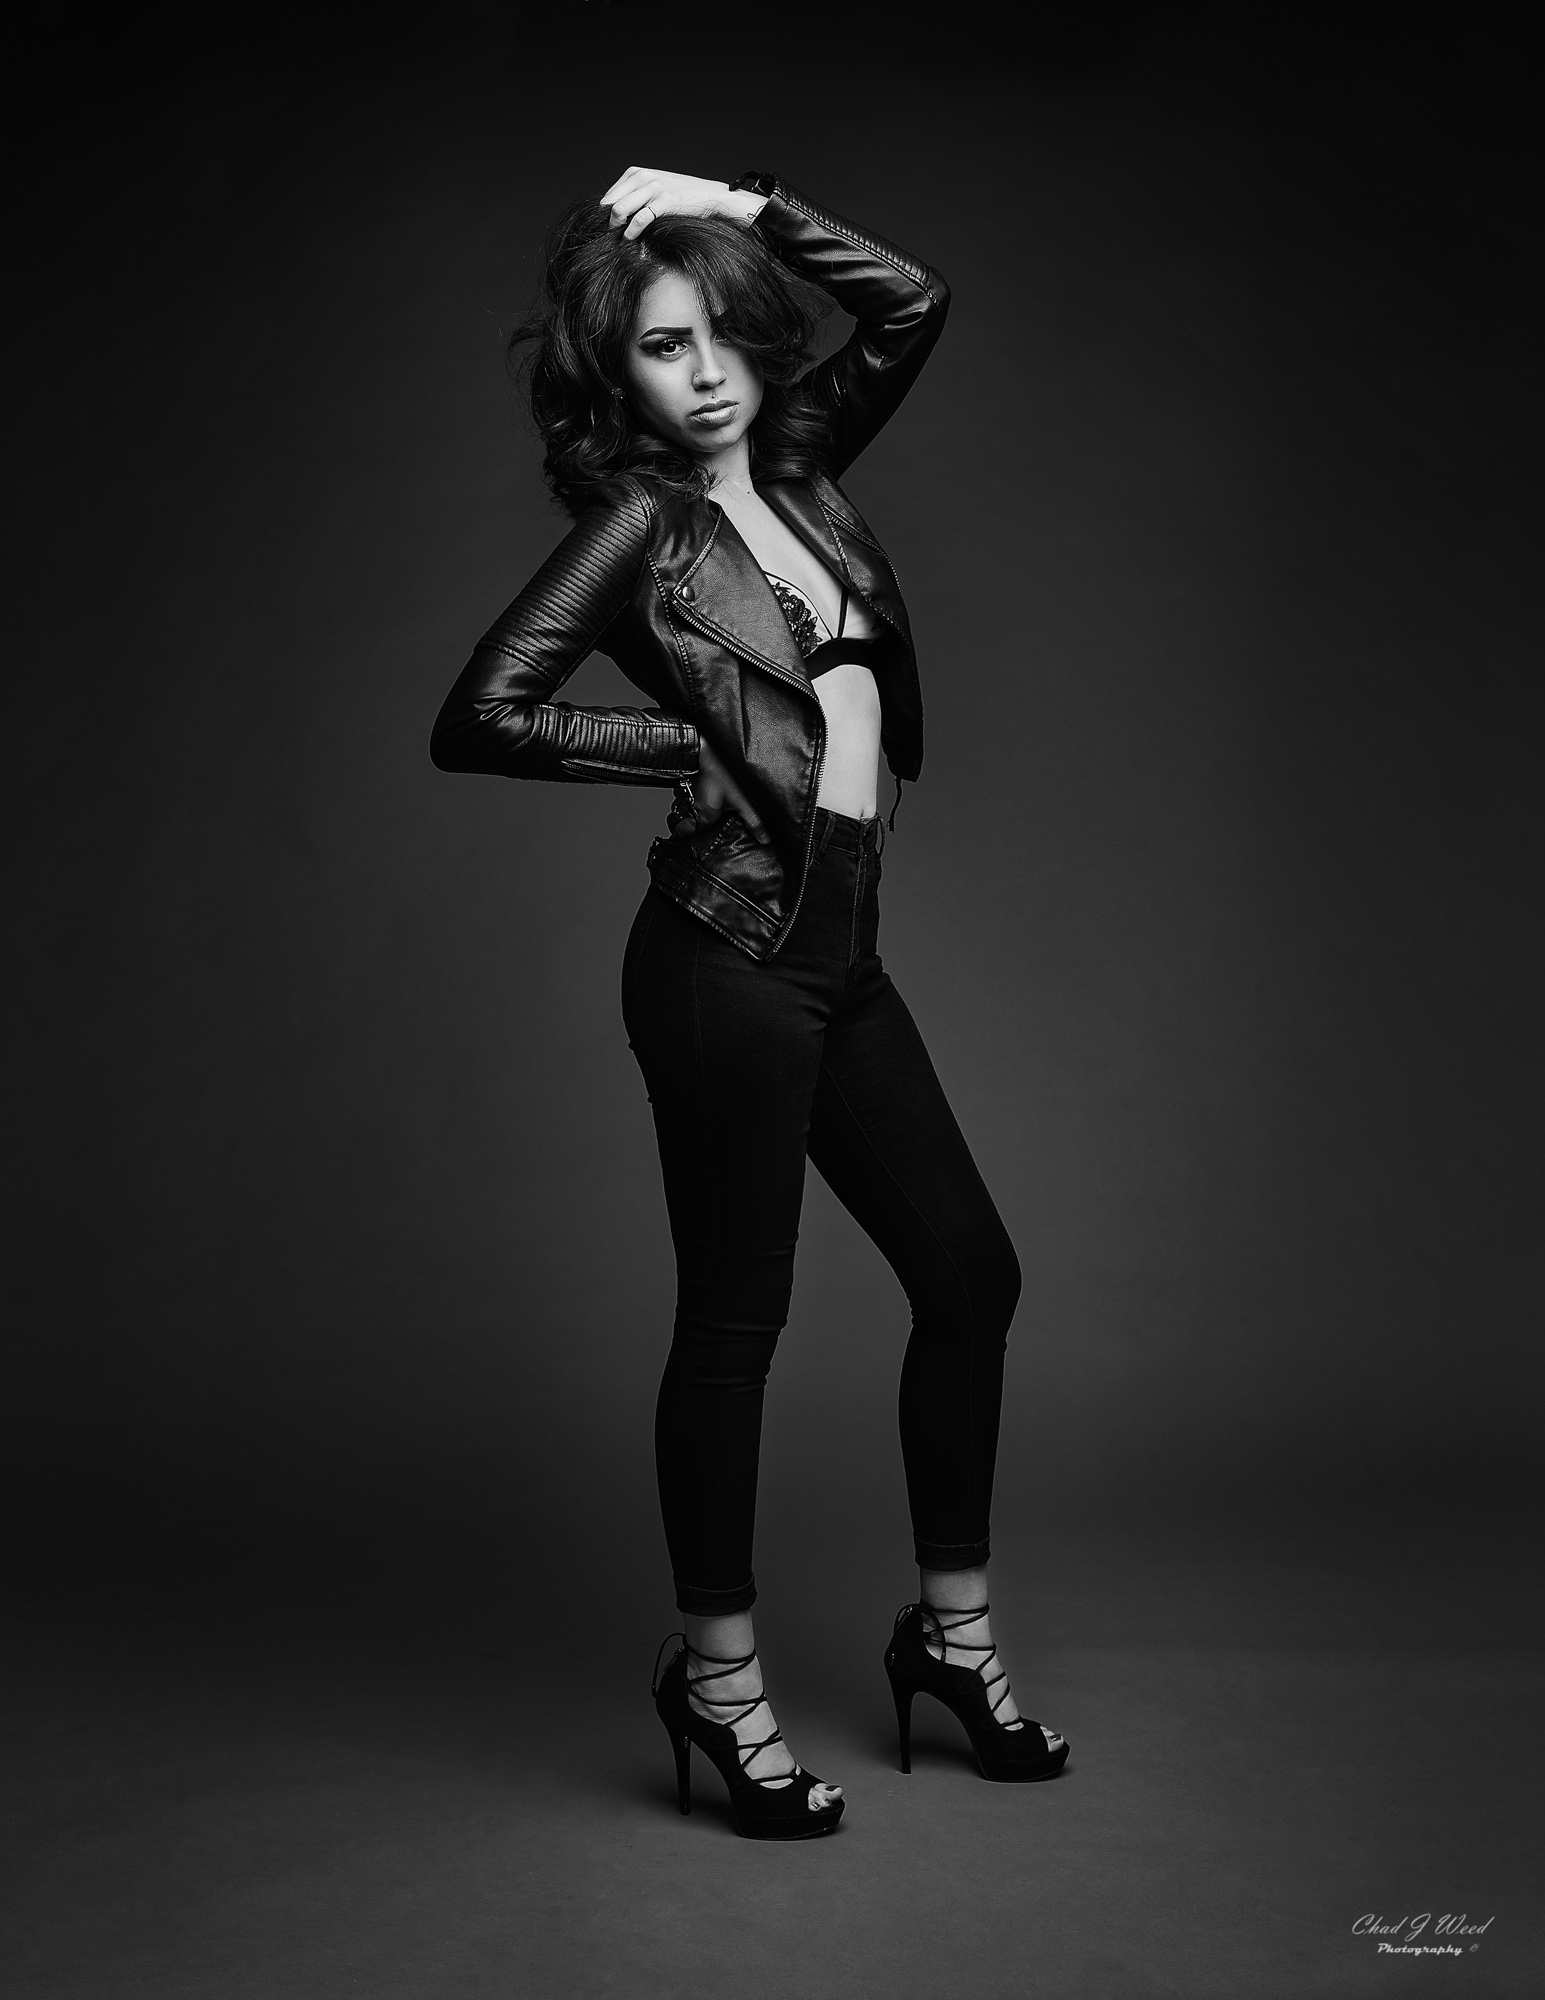 Carissa Fashion by Mesa Arizona Portrait Photographer Chad Weed